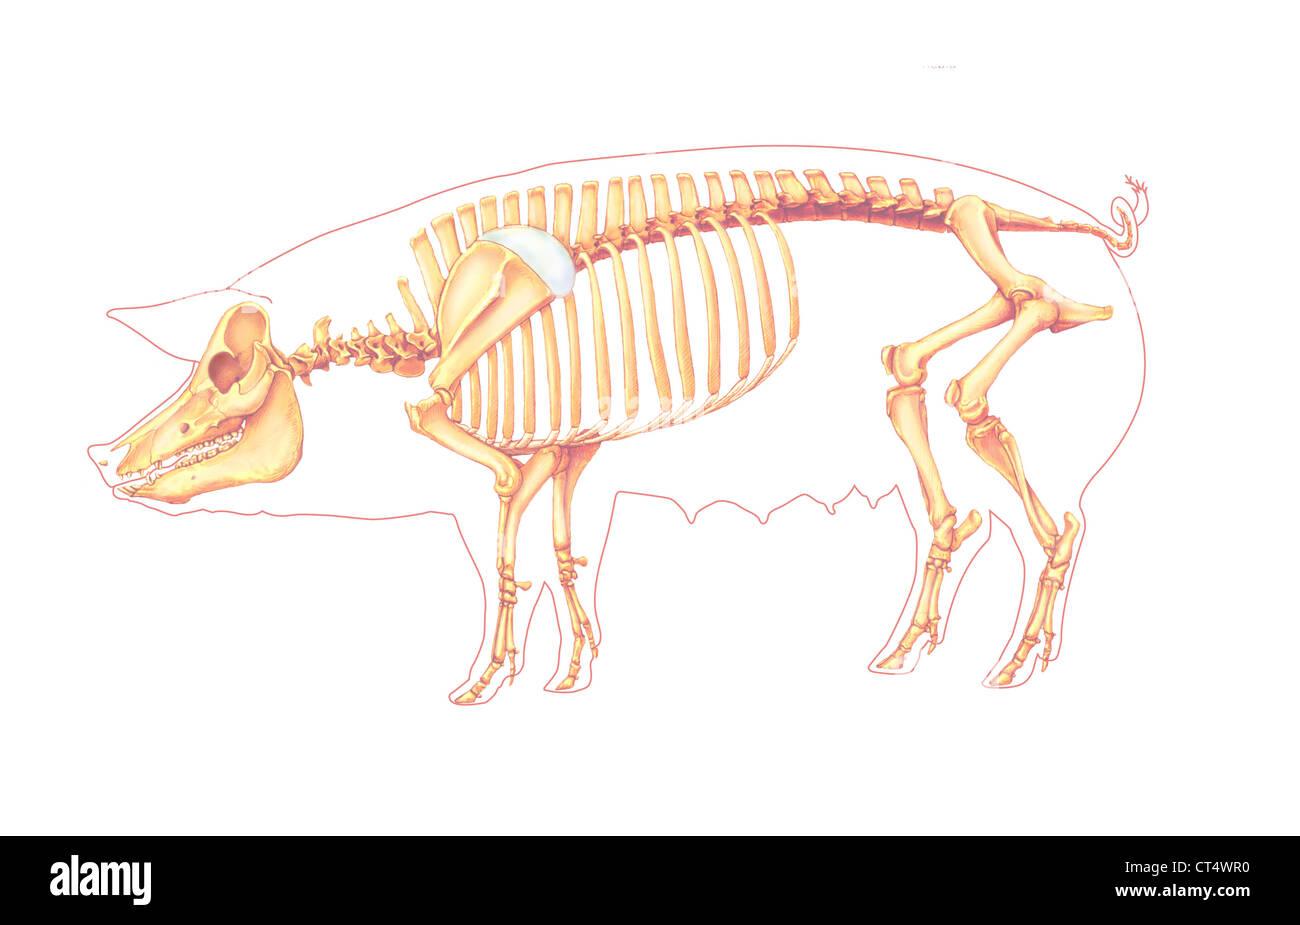 Pig Anatomy Stock Photos & Pig Anatomy Stock Images - Alamy